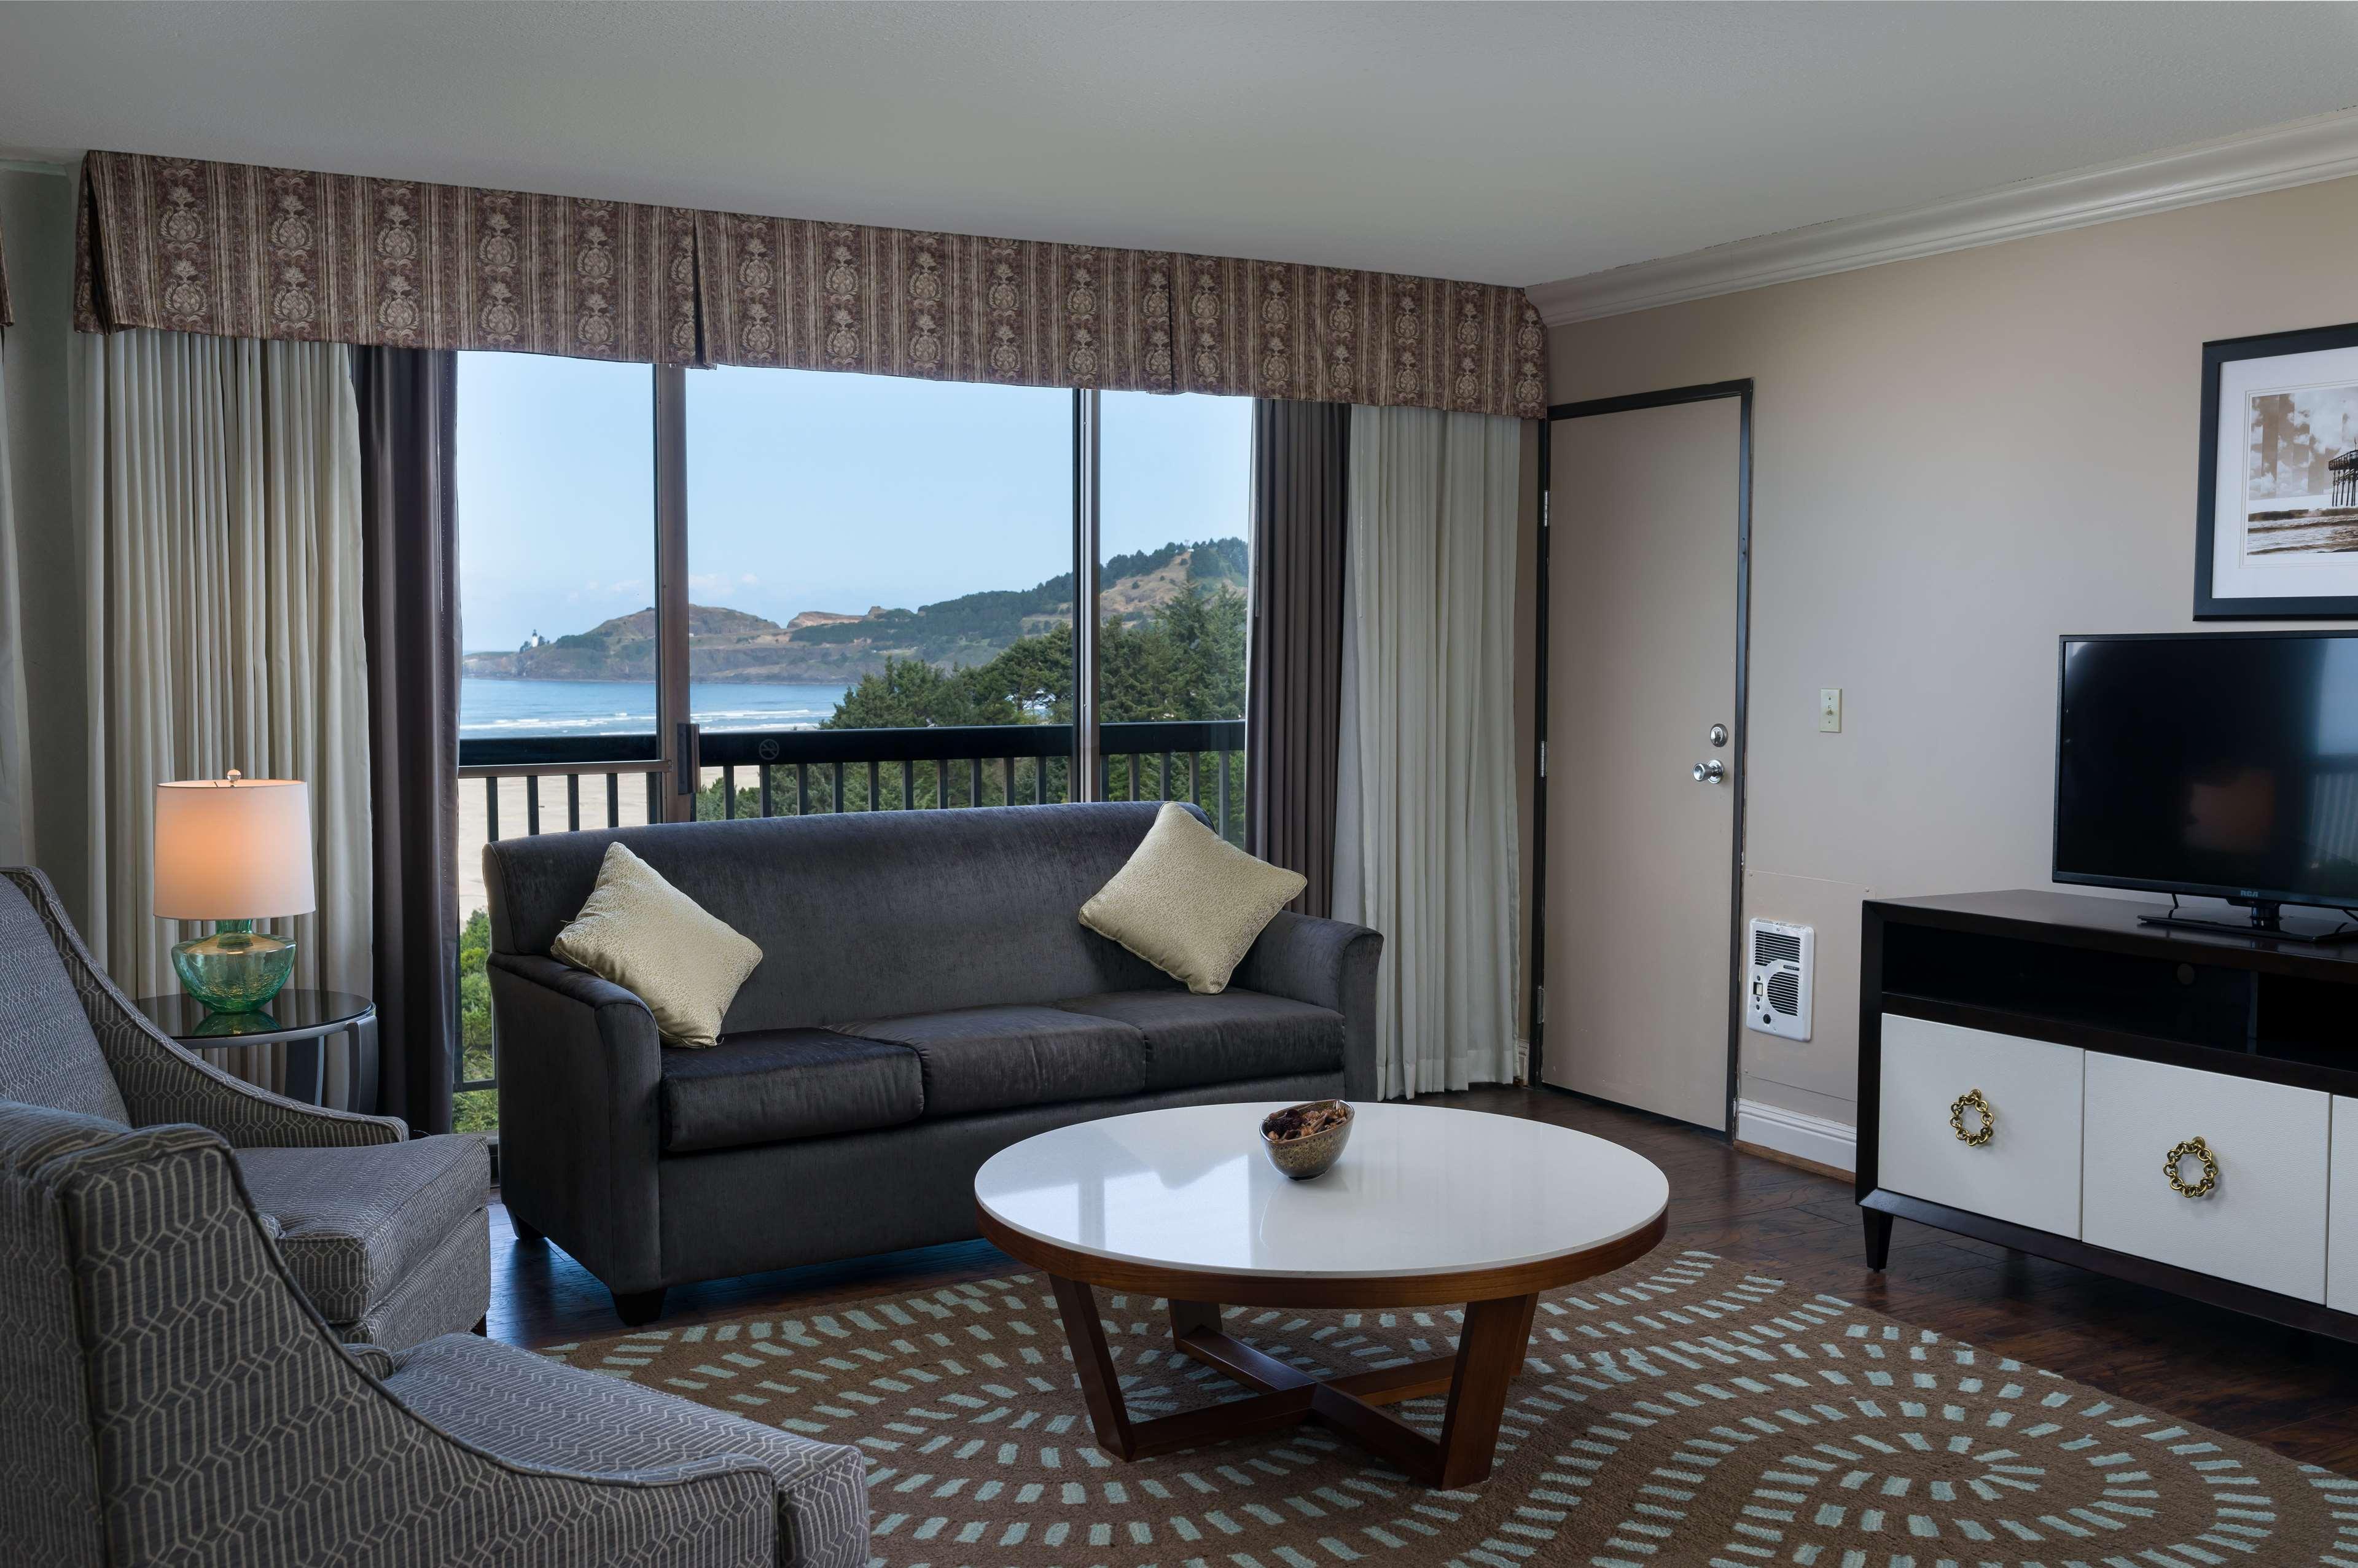 Best Western Agate Beach Inn image 15